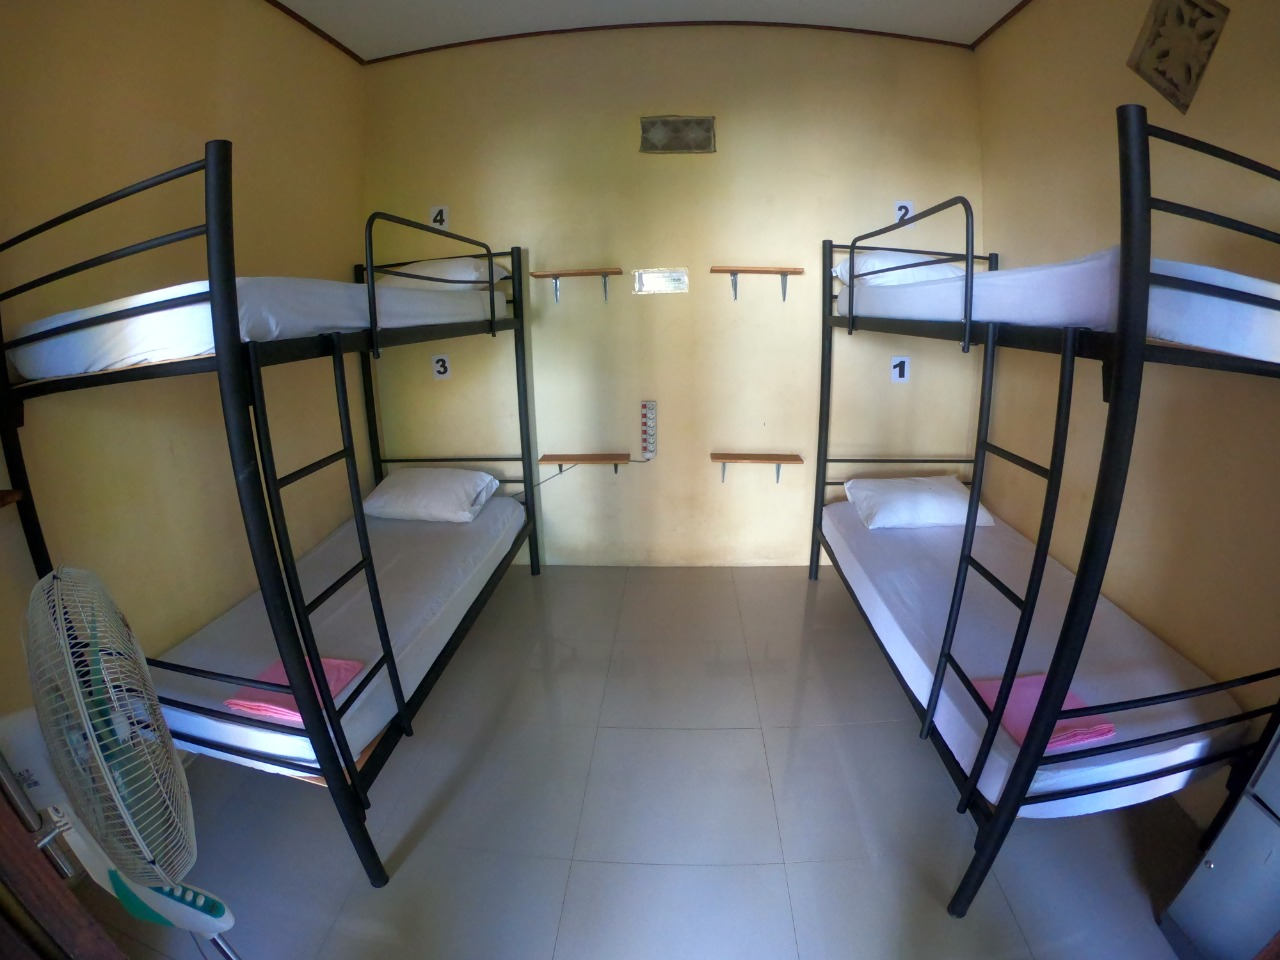 dorm 4 beds